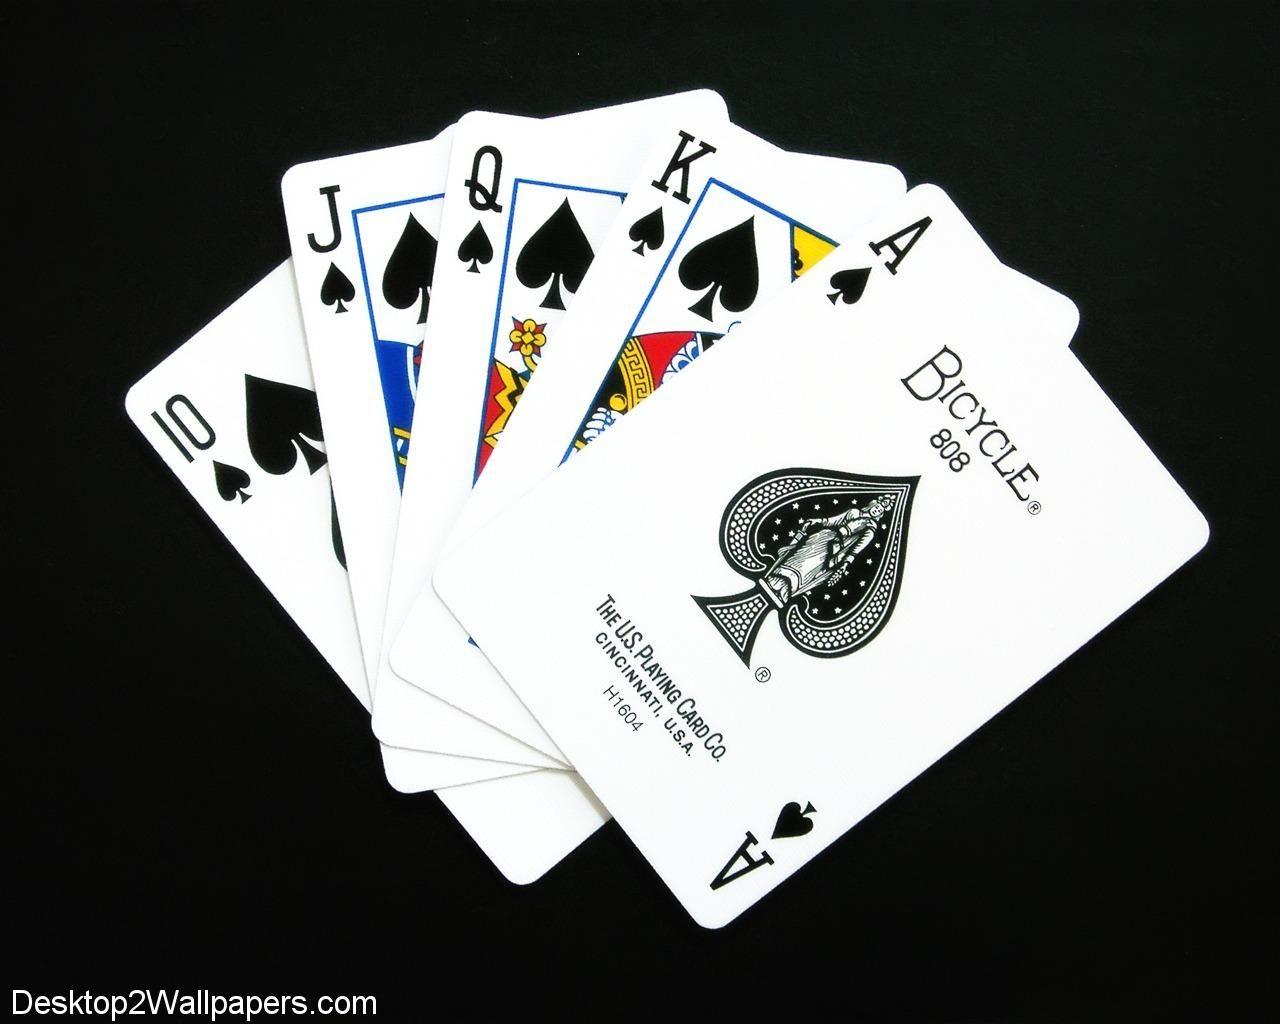 trains games gambling game card